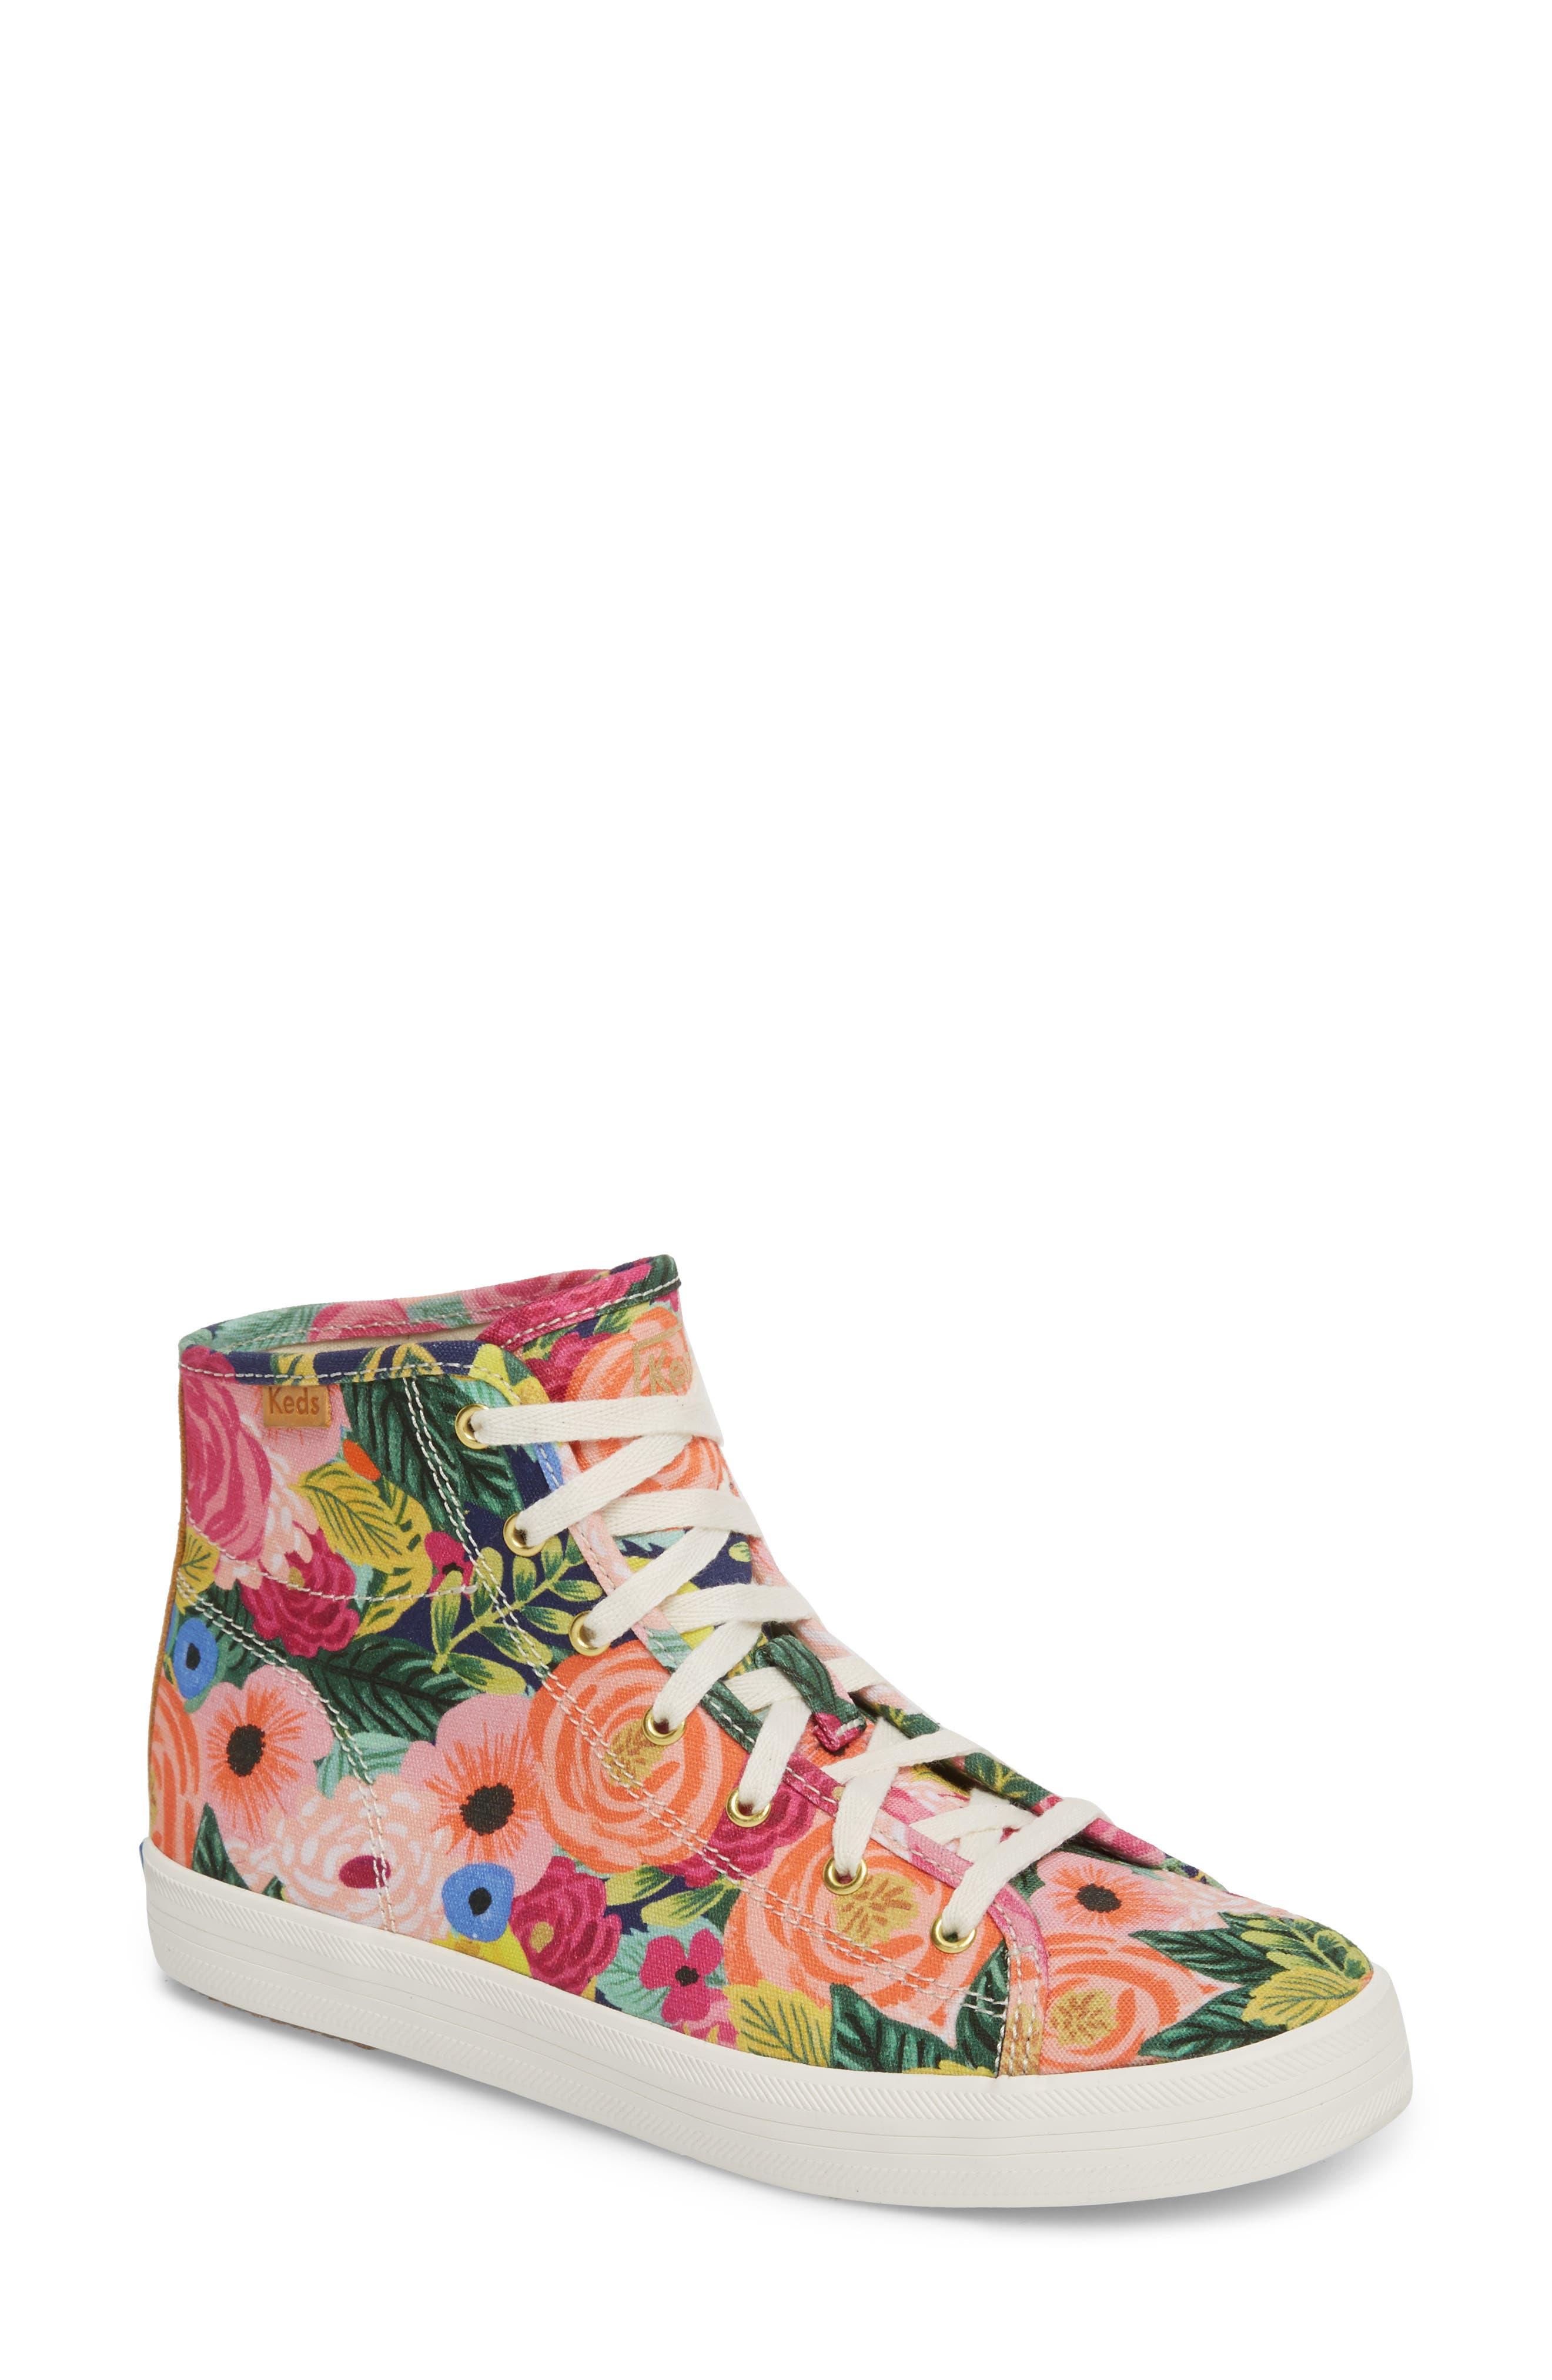 x Rifle Paper Co. Kickstart Julie High Top Sneaker,                             Main thumbnail 1, color,                             Pink Multi